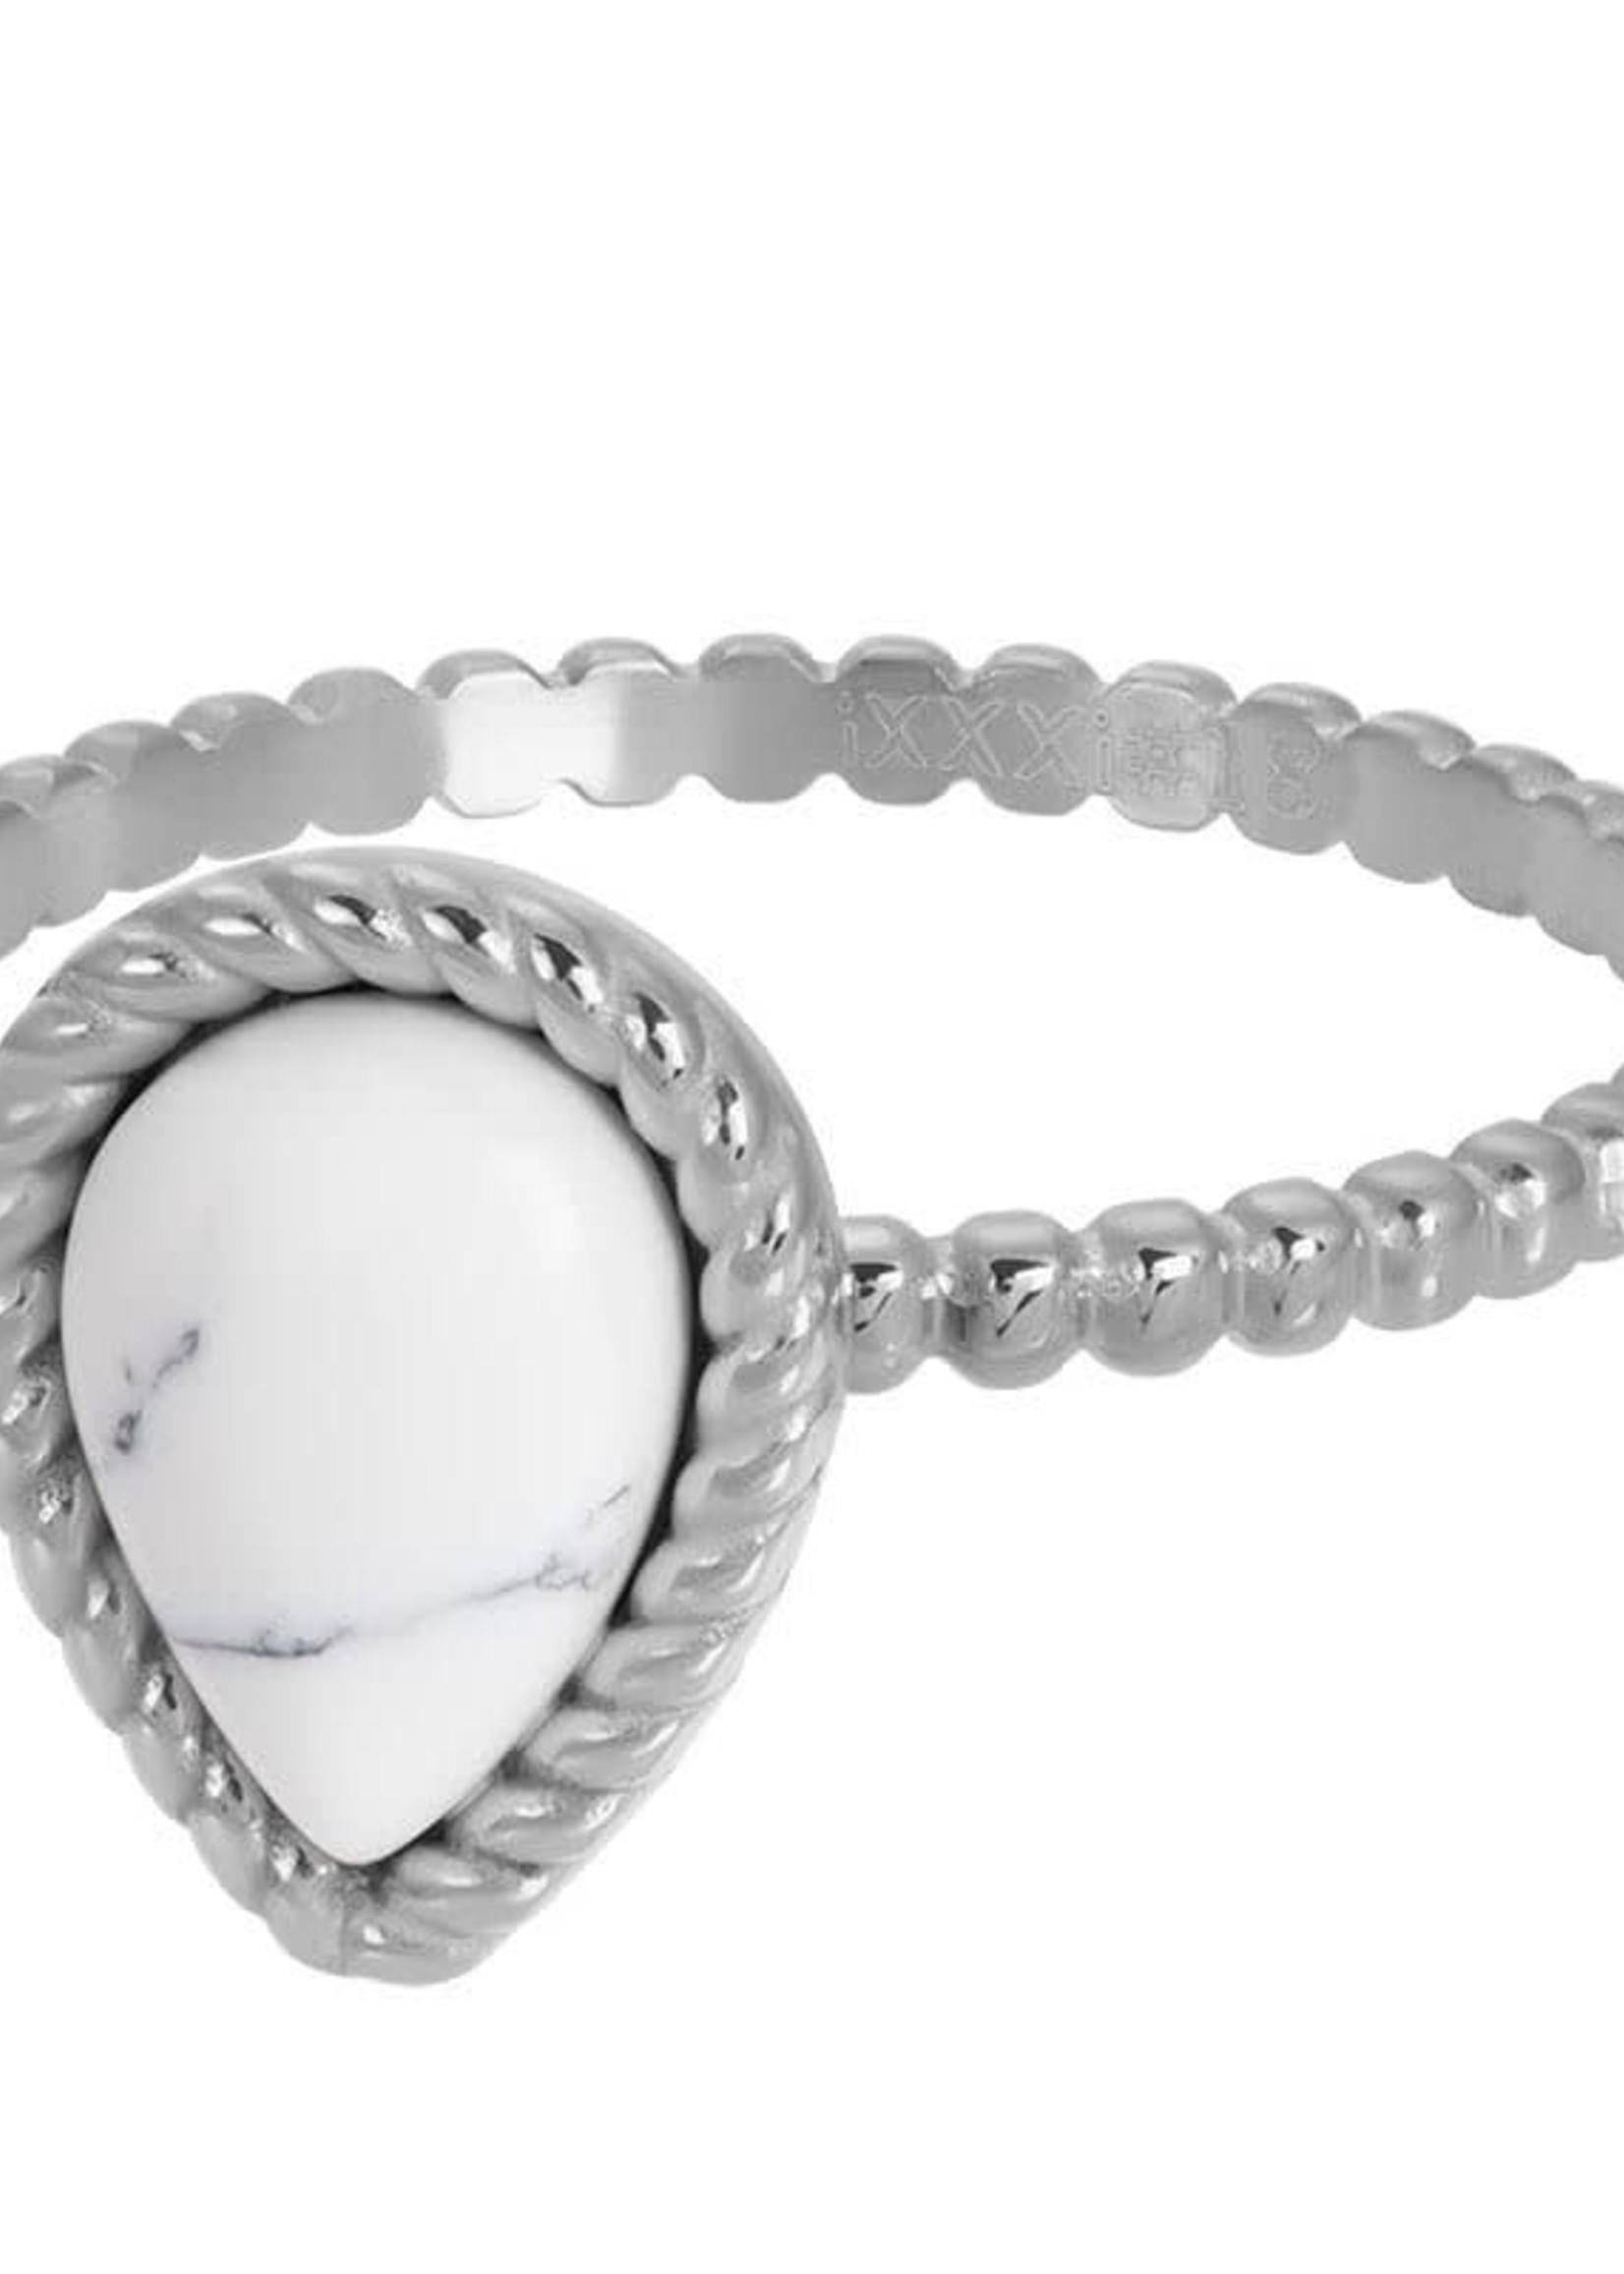 iXXXi Jewelry iXXXi vulring Magic white - staal